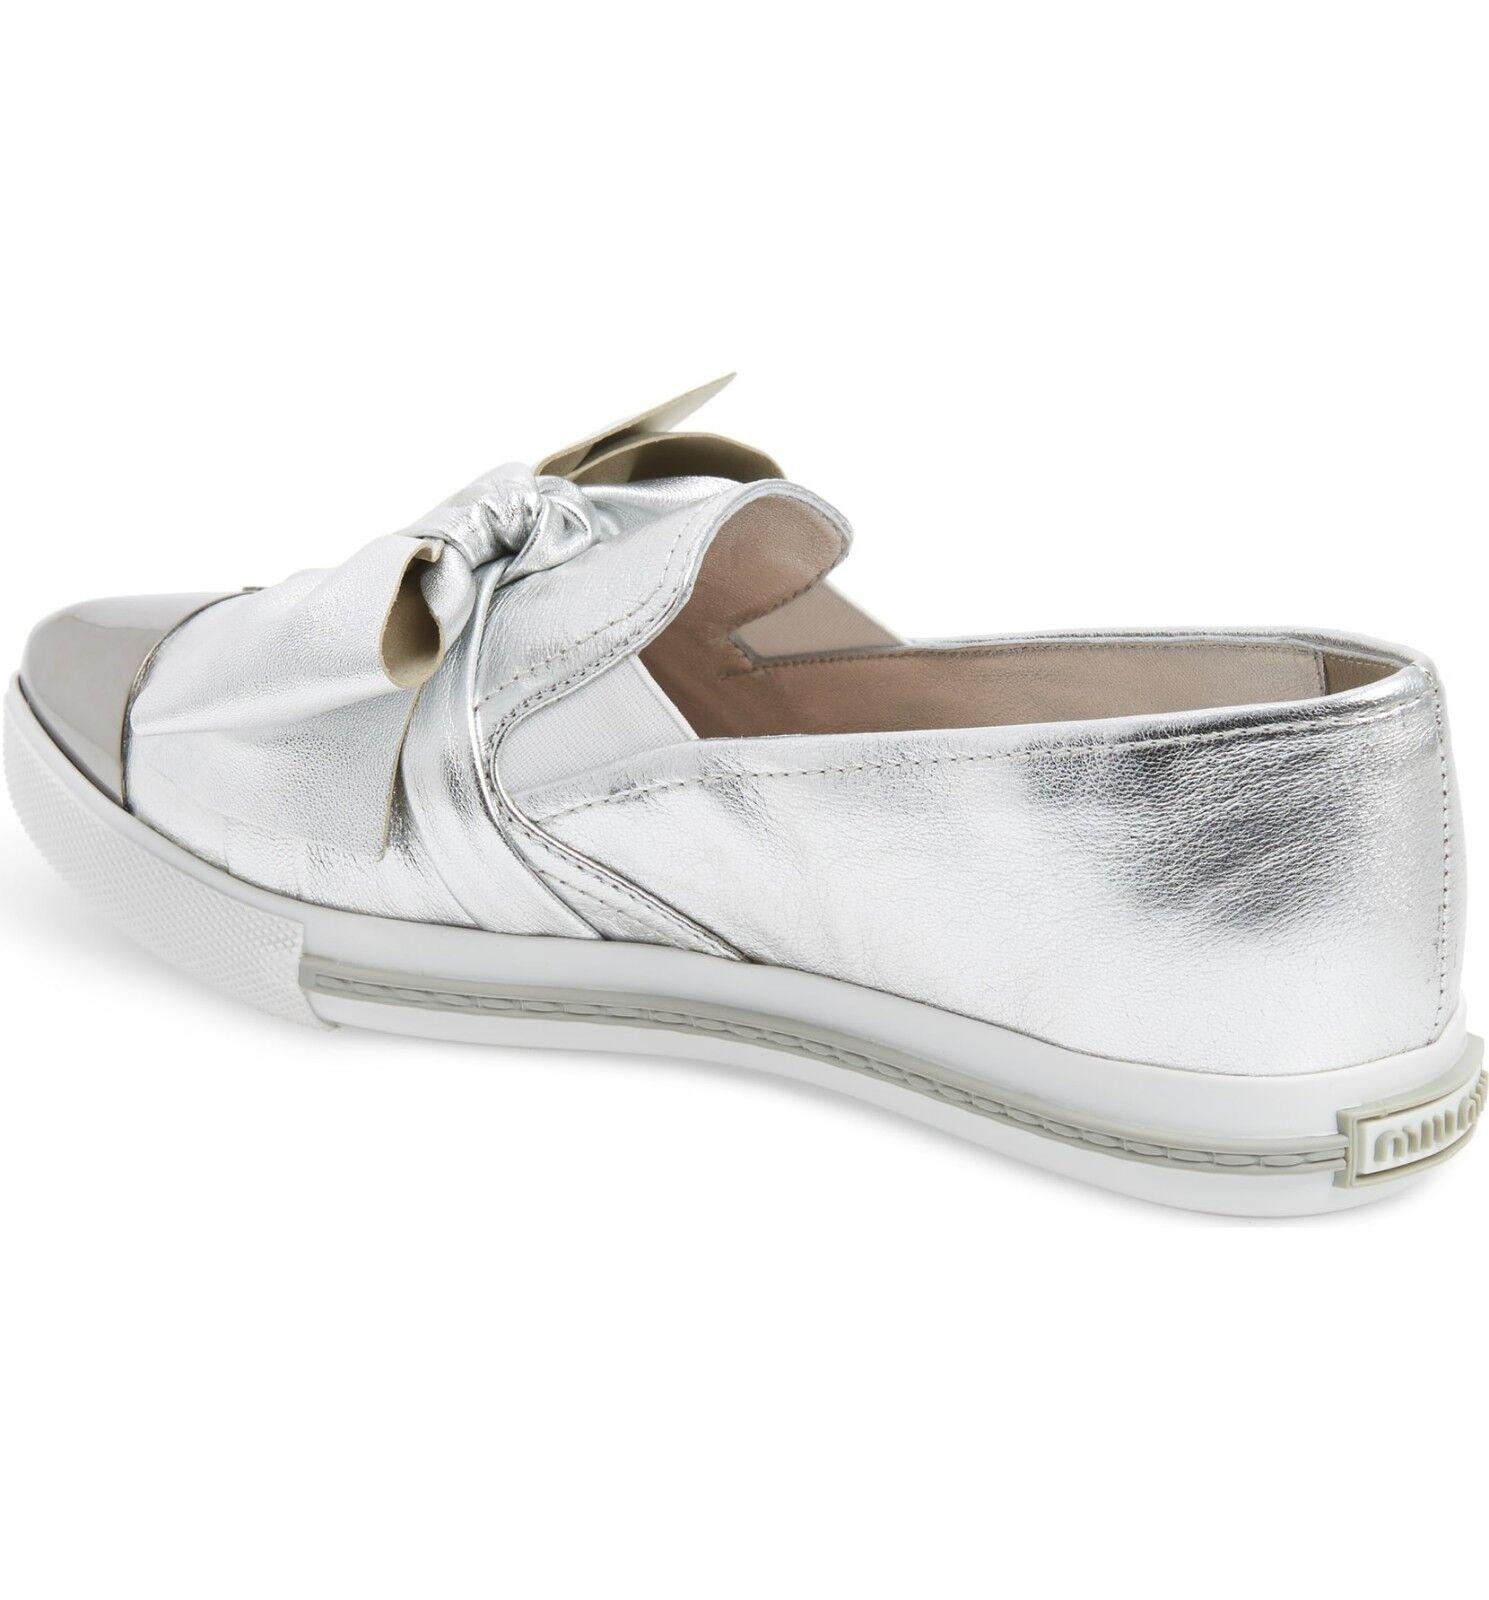 Miu Miu Cap Toe Hidden Wedge baskets chaussures argent argent argent 40 a71ab0